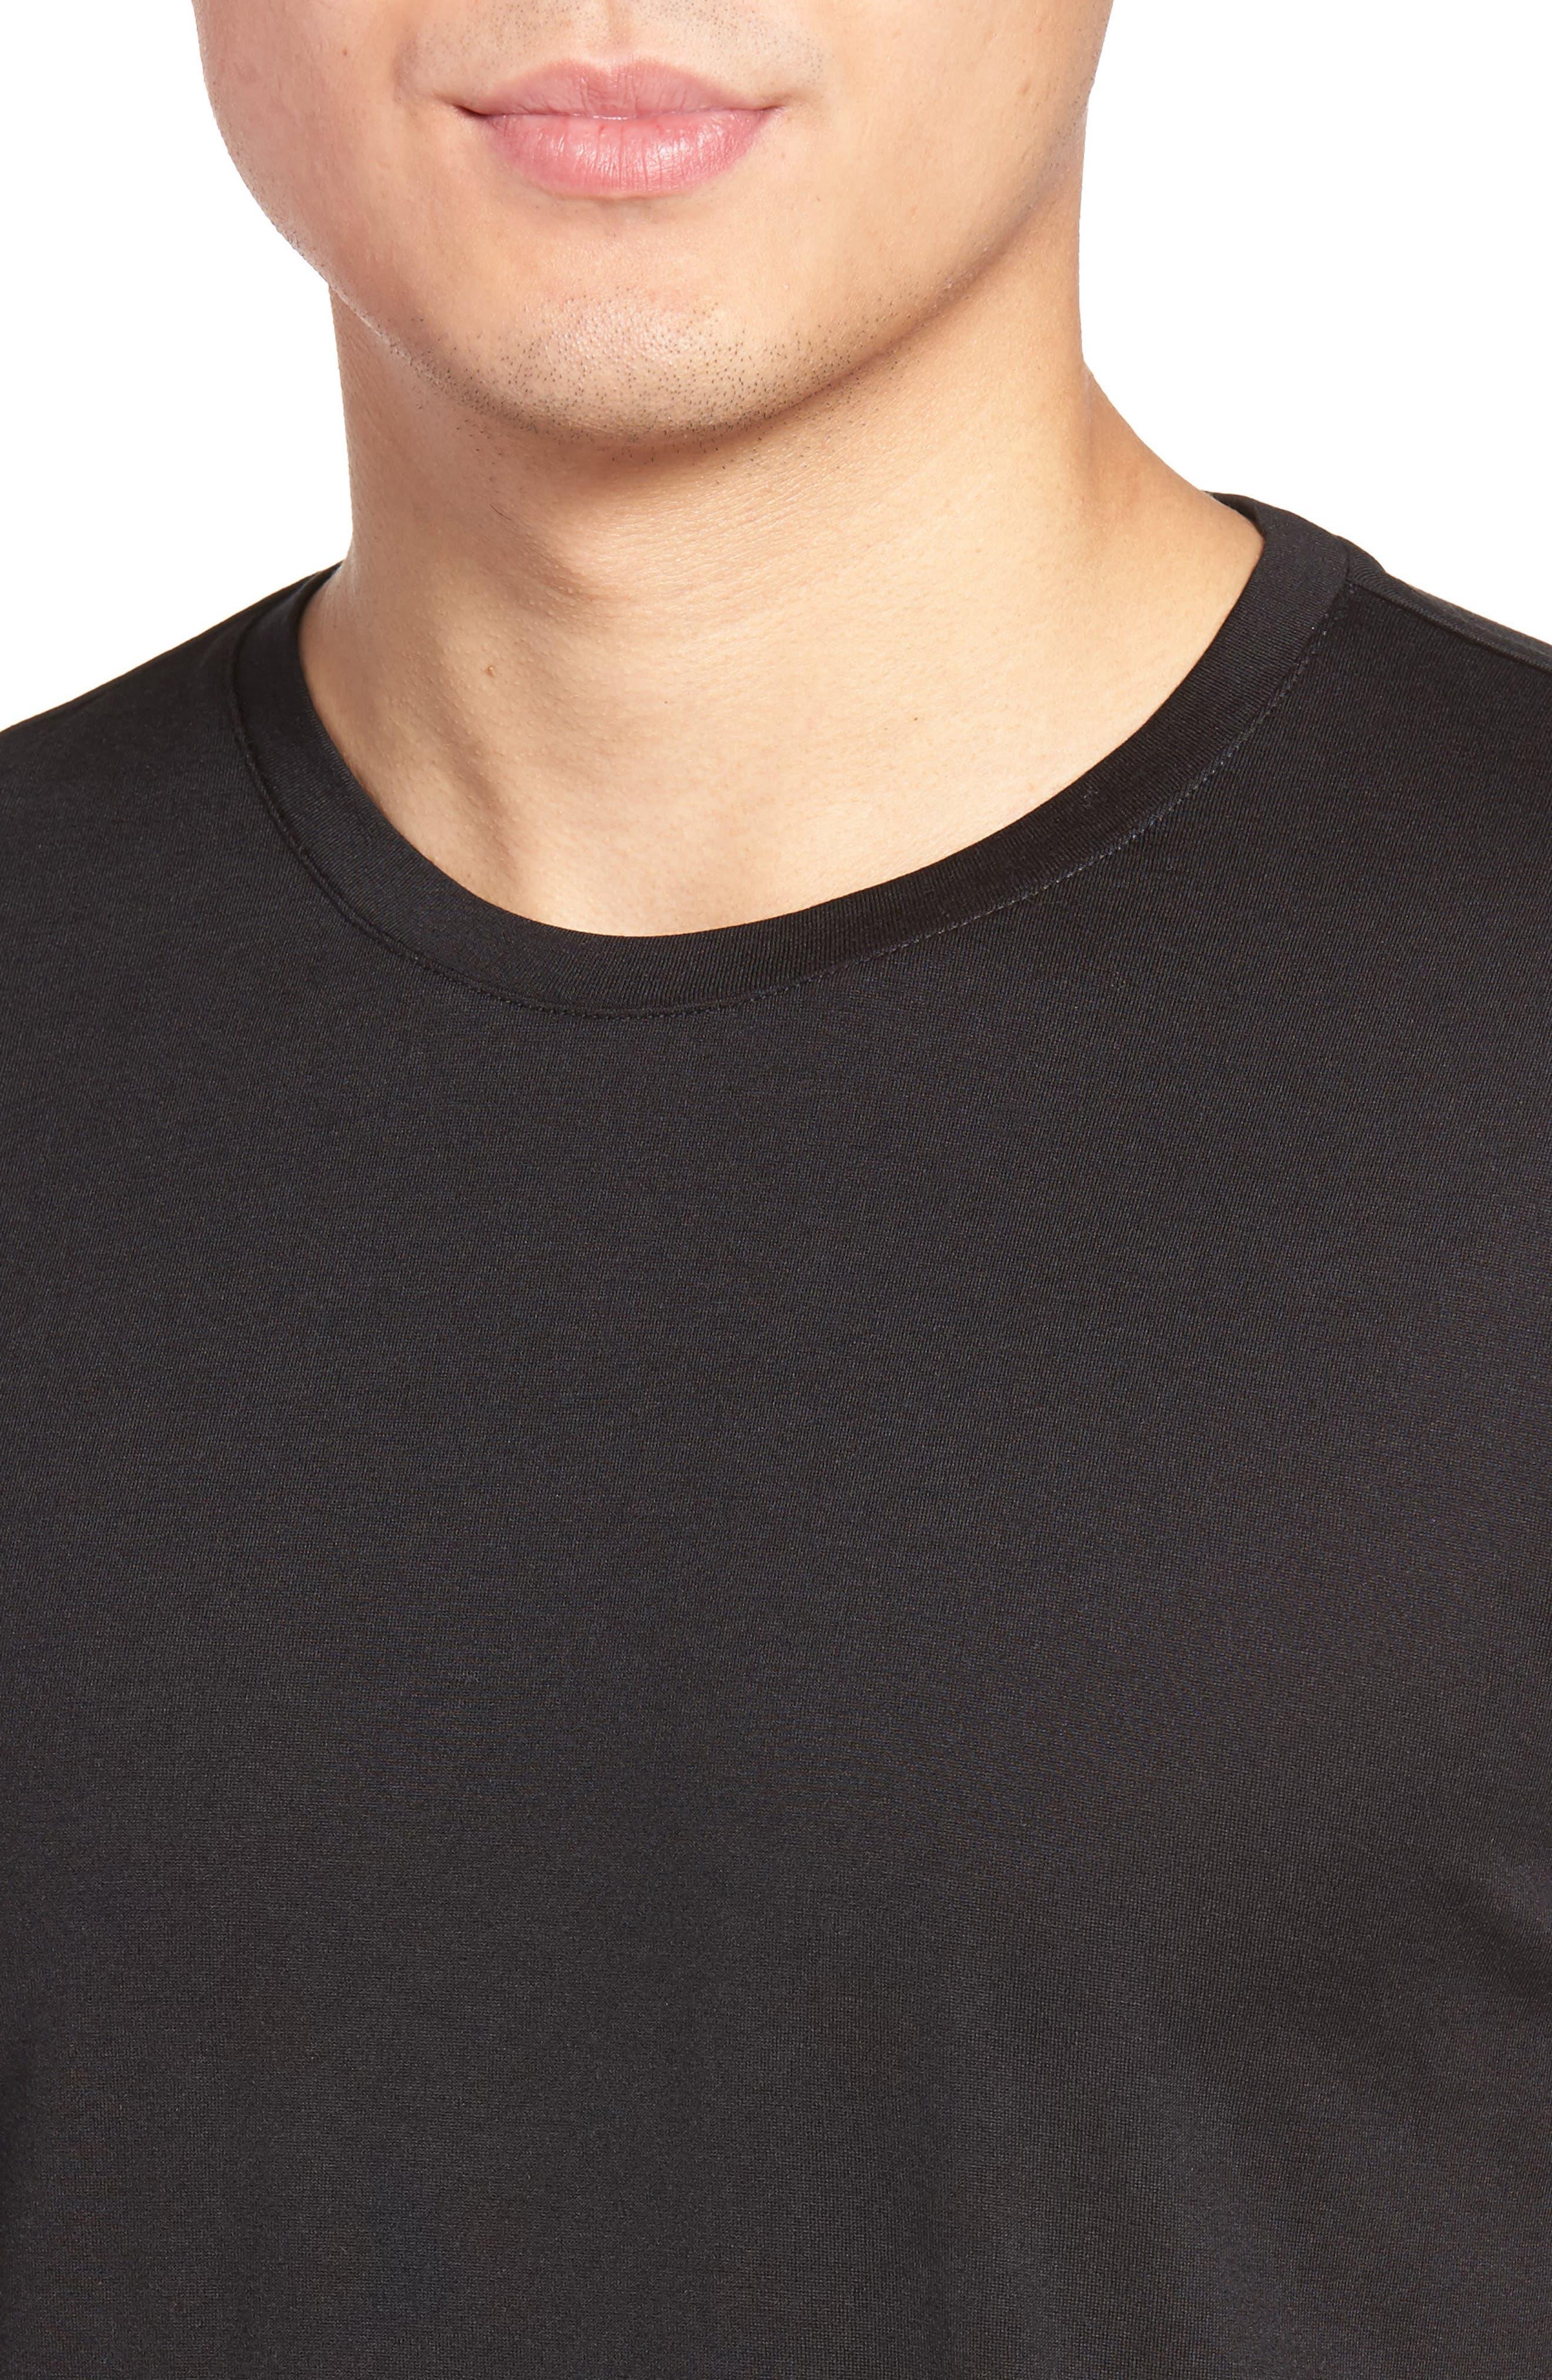 Silk & Cotton Crewneck T-Shirt,                             Alternate thumbnail 4, color,                             001